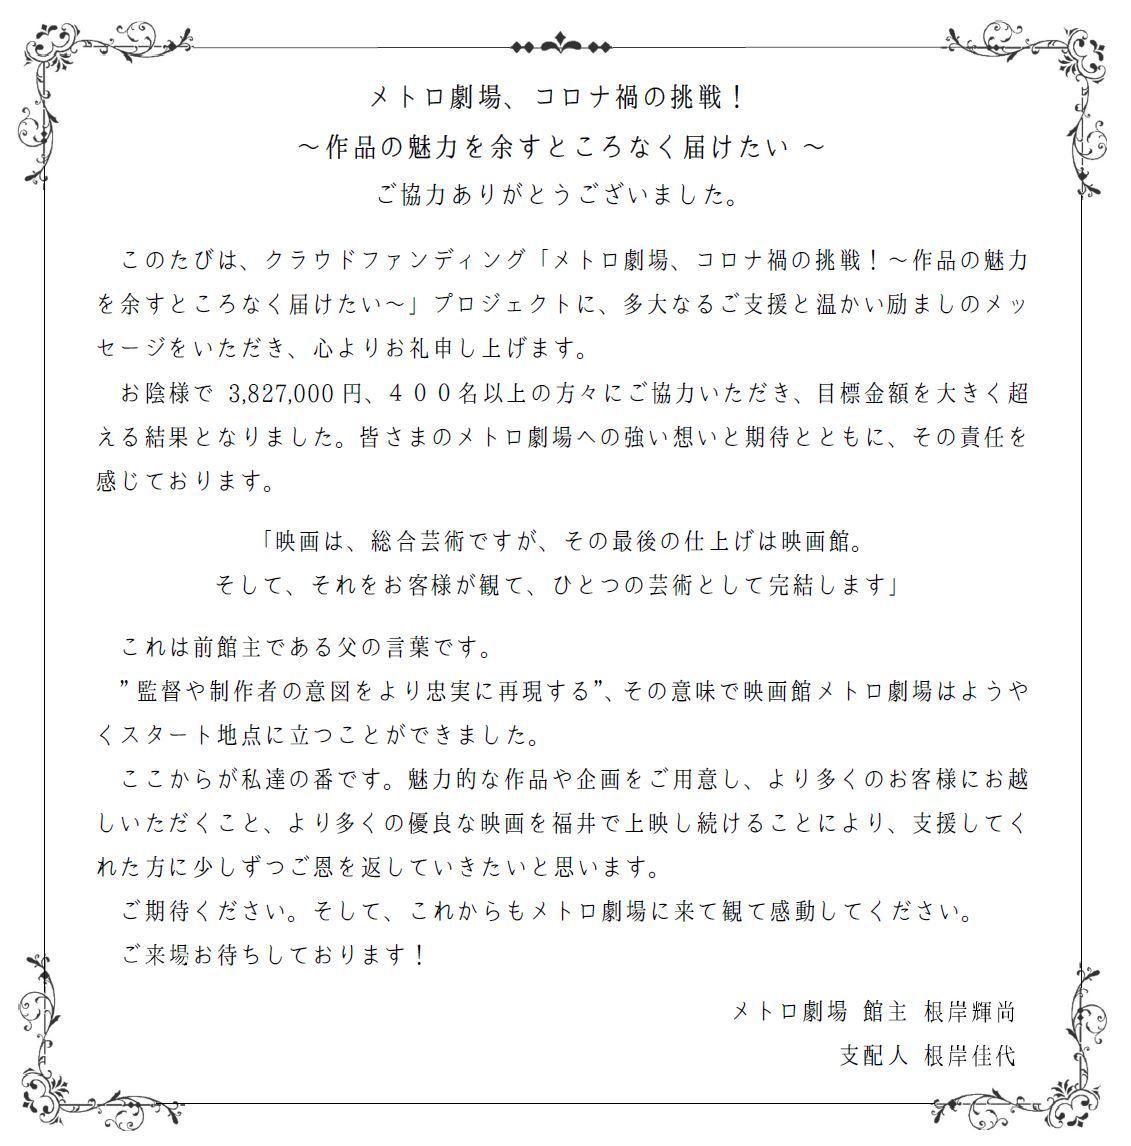 cf_thankyou.jpg